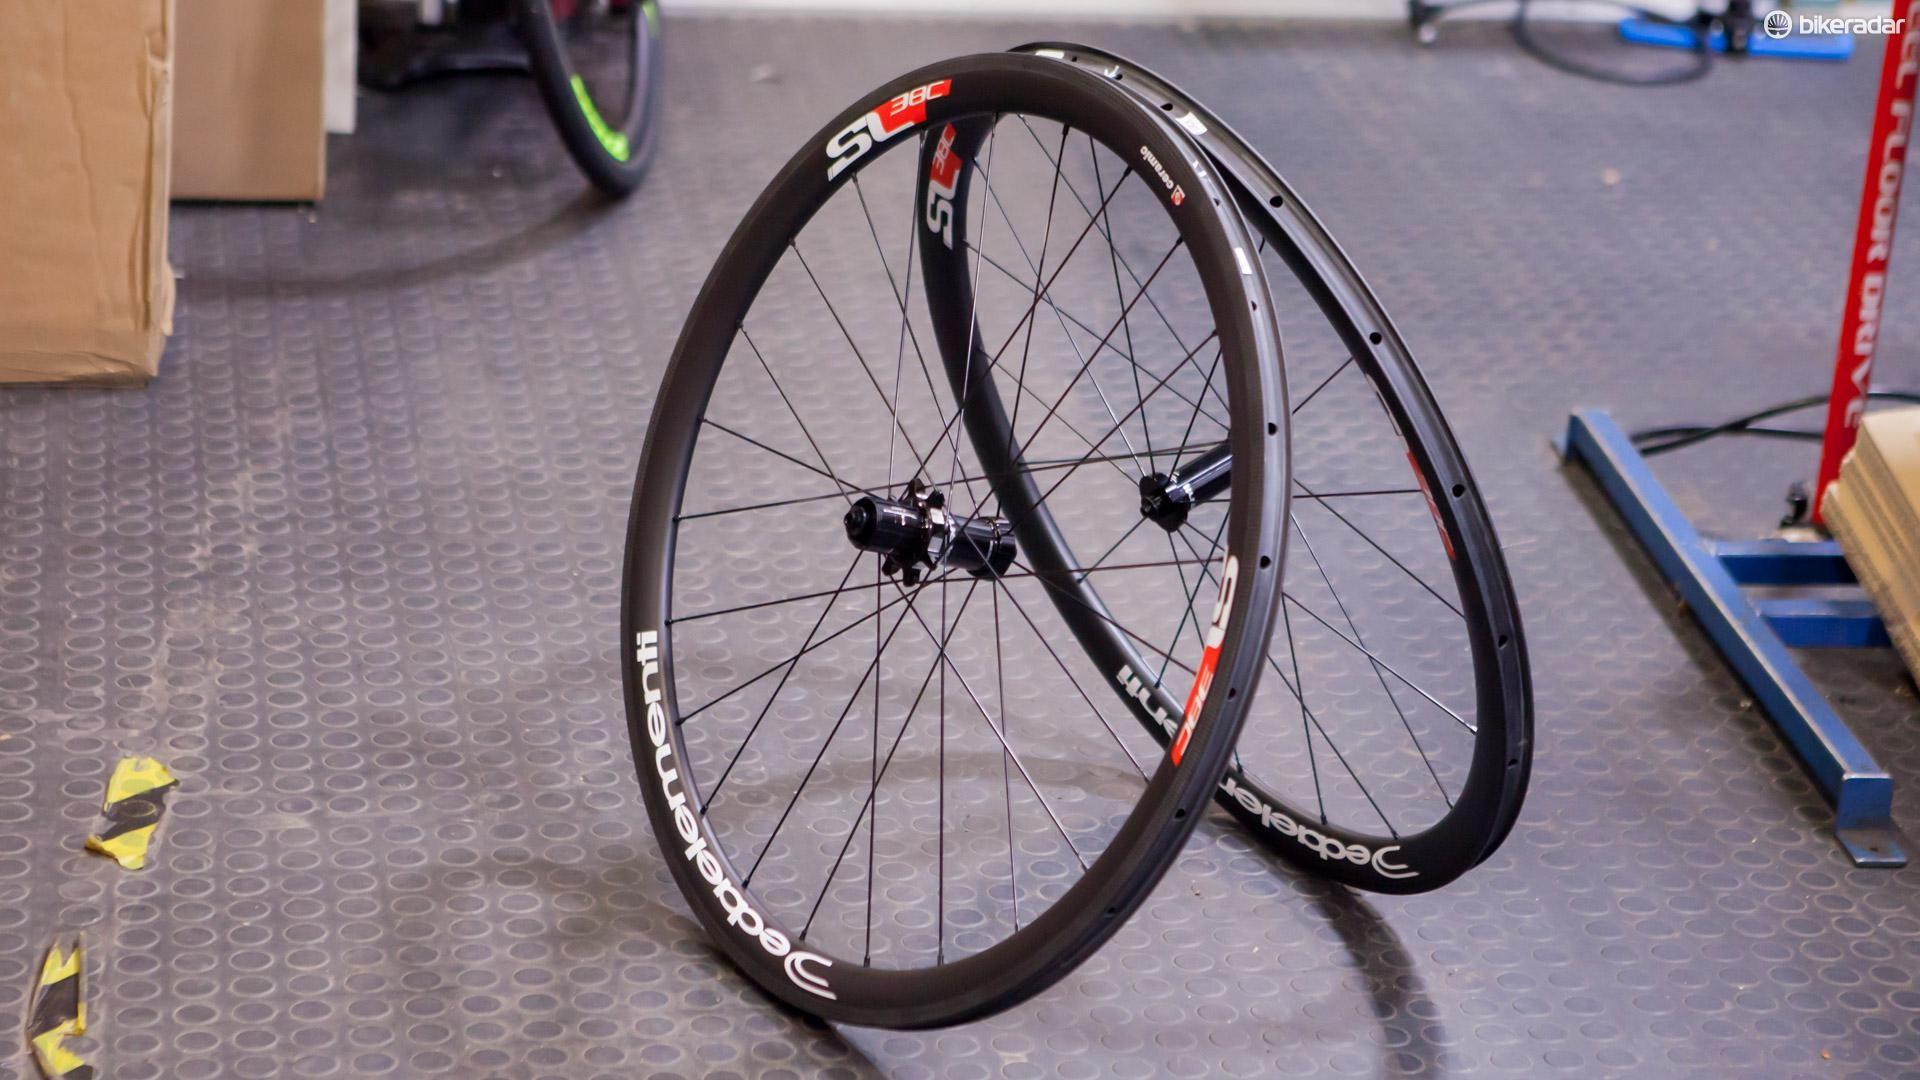 Deda's latest lightweight carbon clinchers